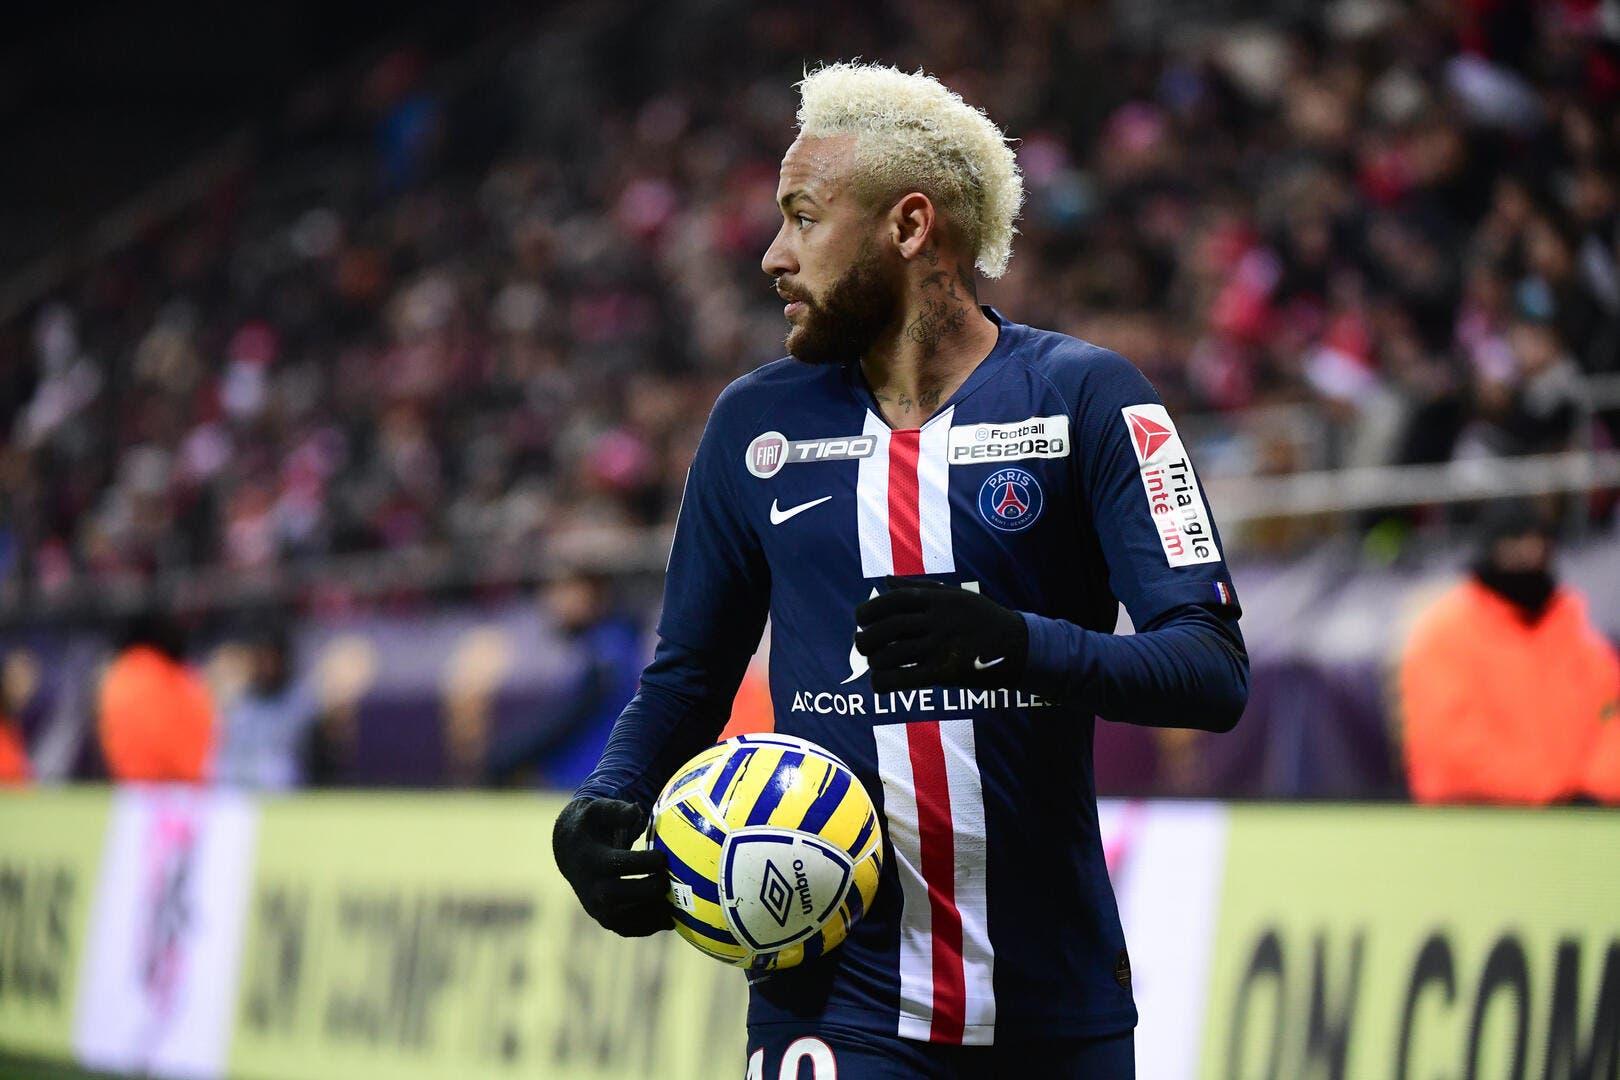 PSG : Neymar ou Messi partira, ça craint à Barcelone